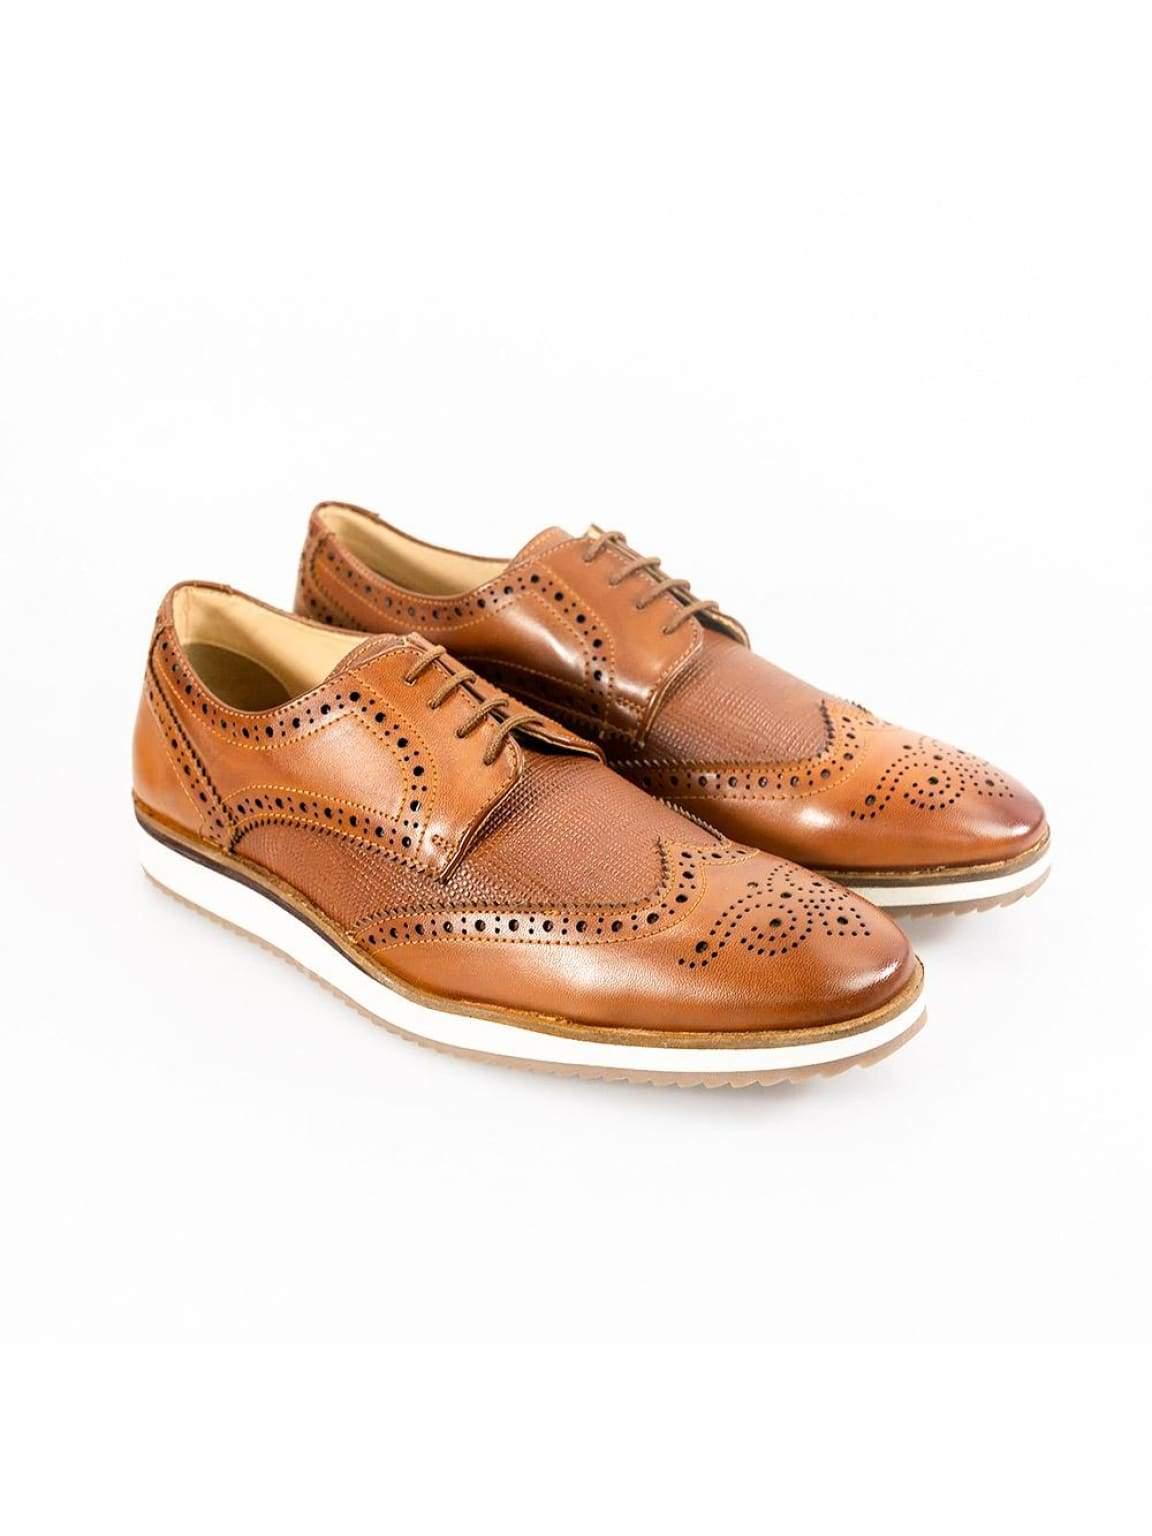 Cavani Mandu Tan Mens Shoe - UK7 | EU41 - Shoes